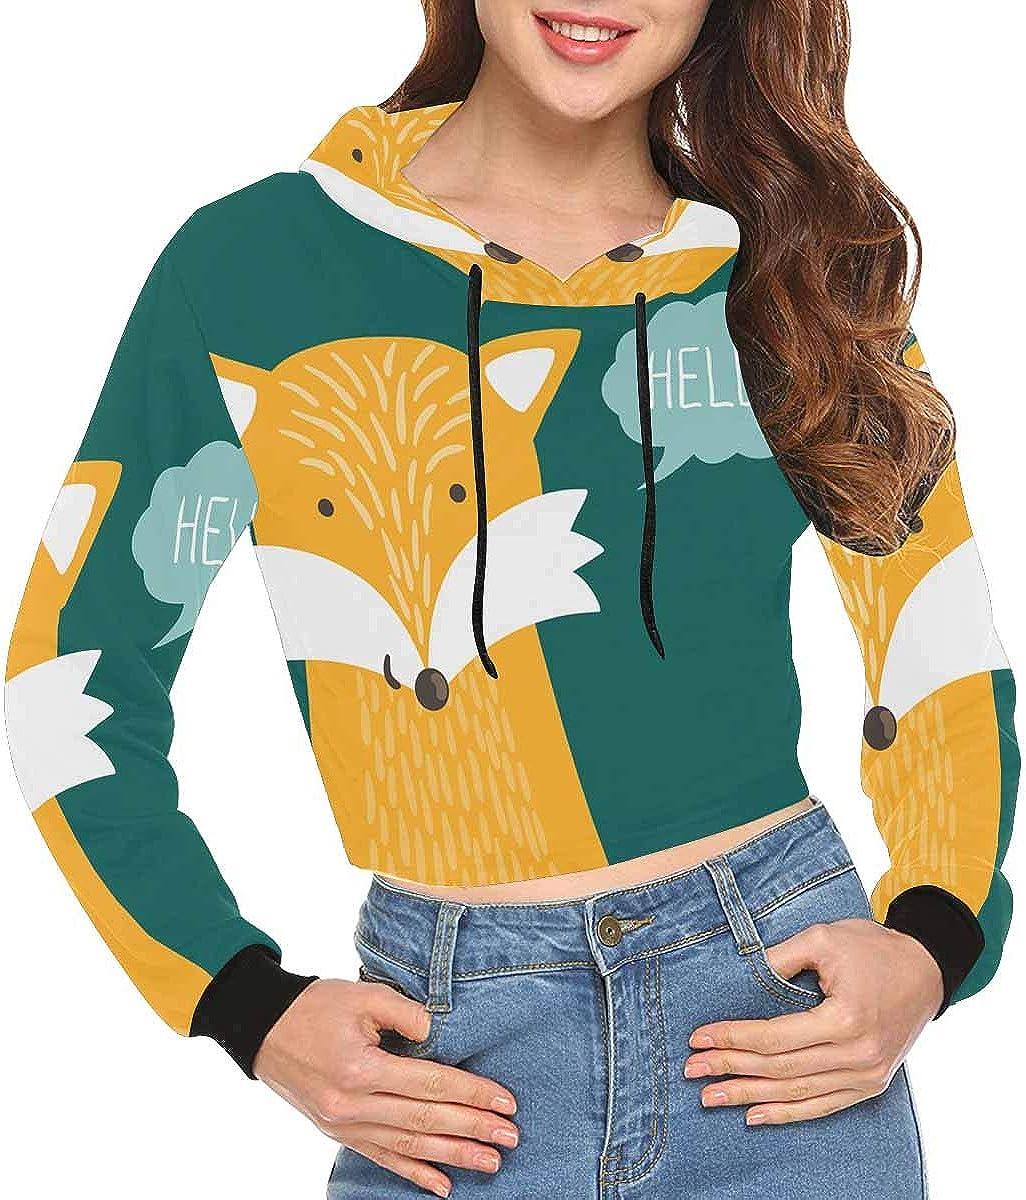 INTERESTPRINT Womens Crop Tops Hoodies Long Sleeve Fashion Sweatshirts XS-2XL